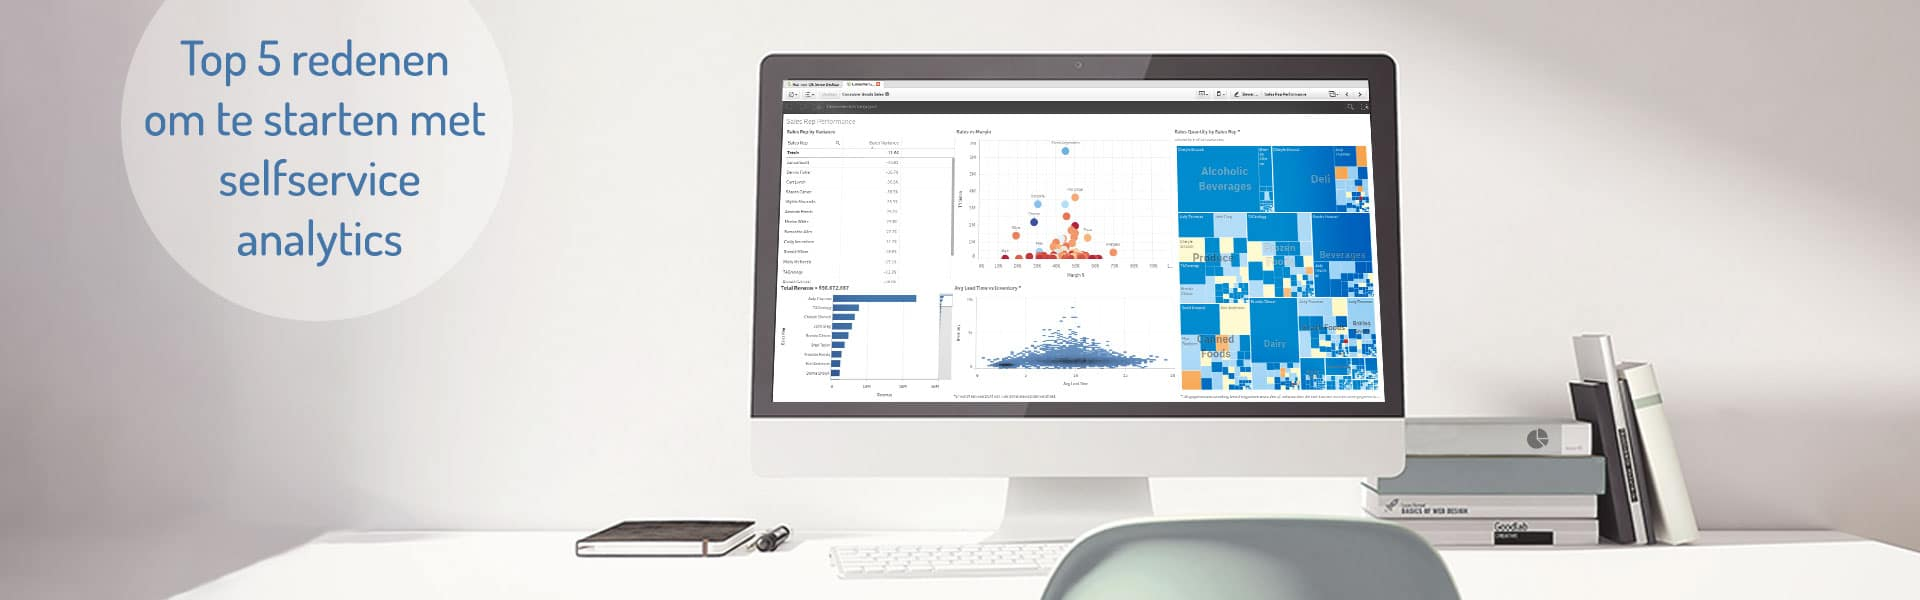 selfservice analytics,business intelligence,selfservice analytics